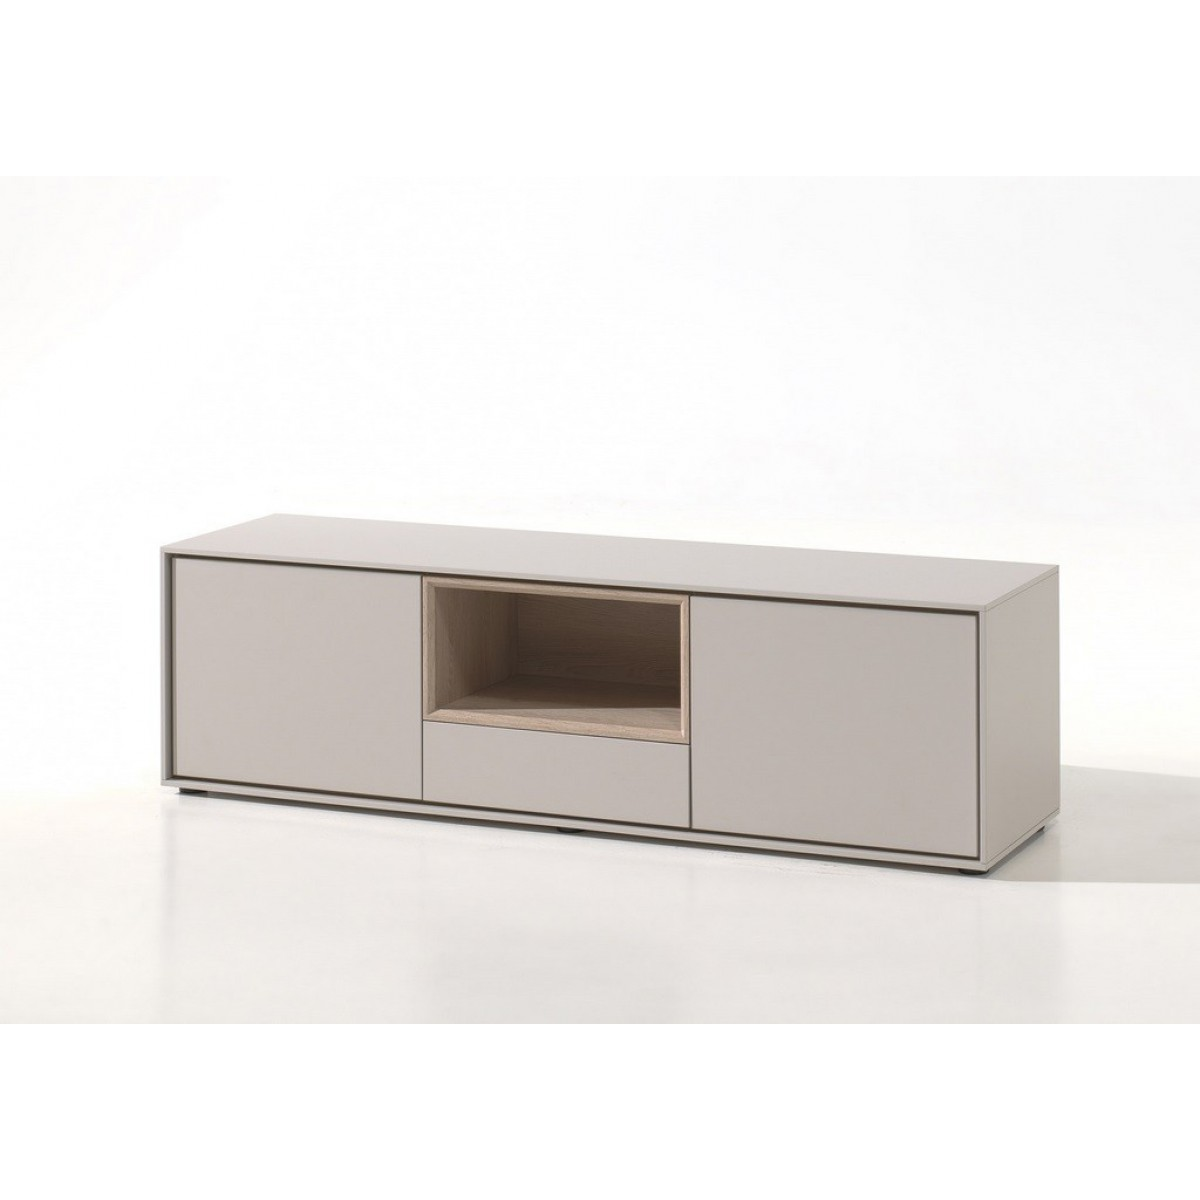 kyara-tv-dressoir-sideboard-c0056a-cashmere